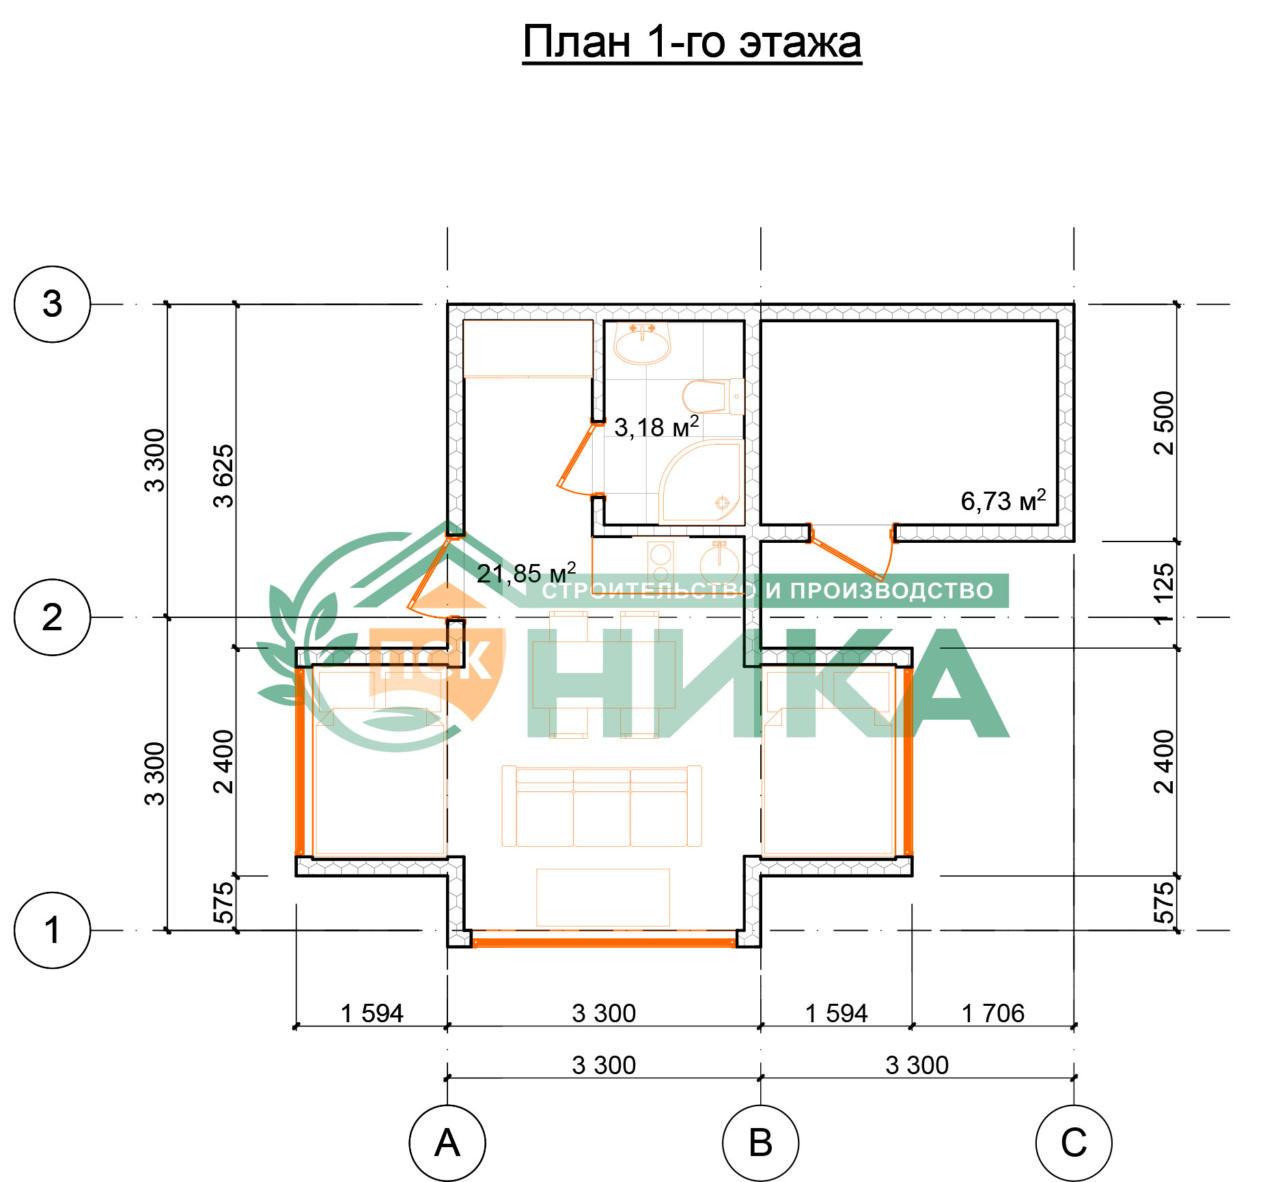 План первого этажа Панорамы Коктебеля